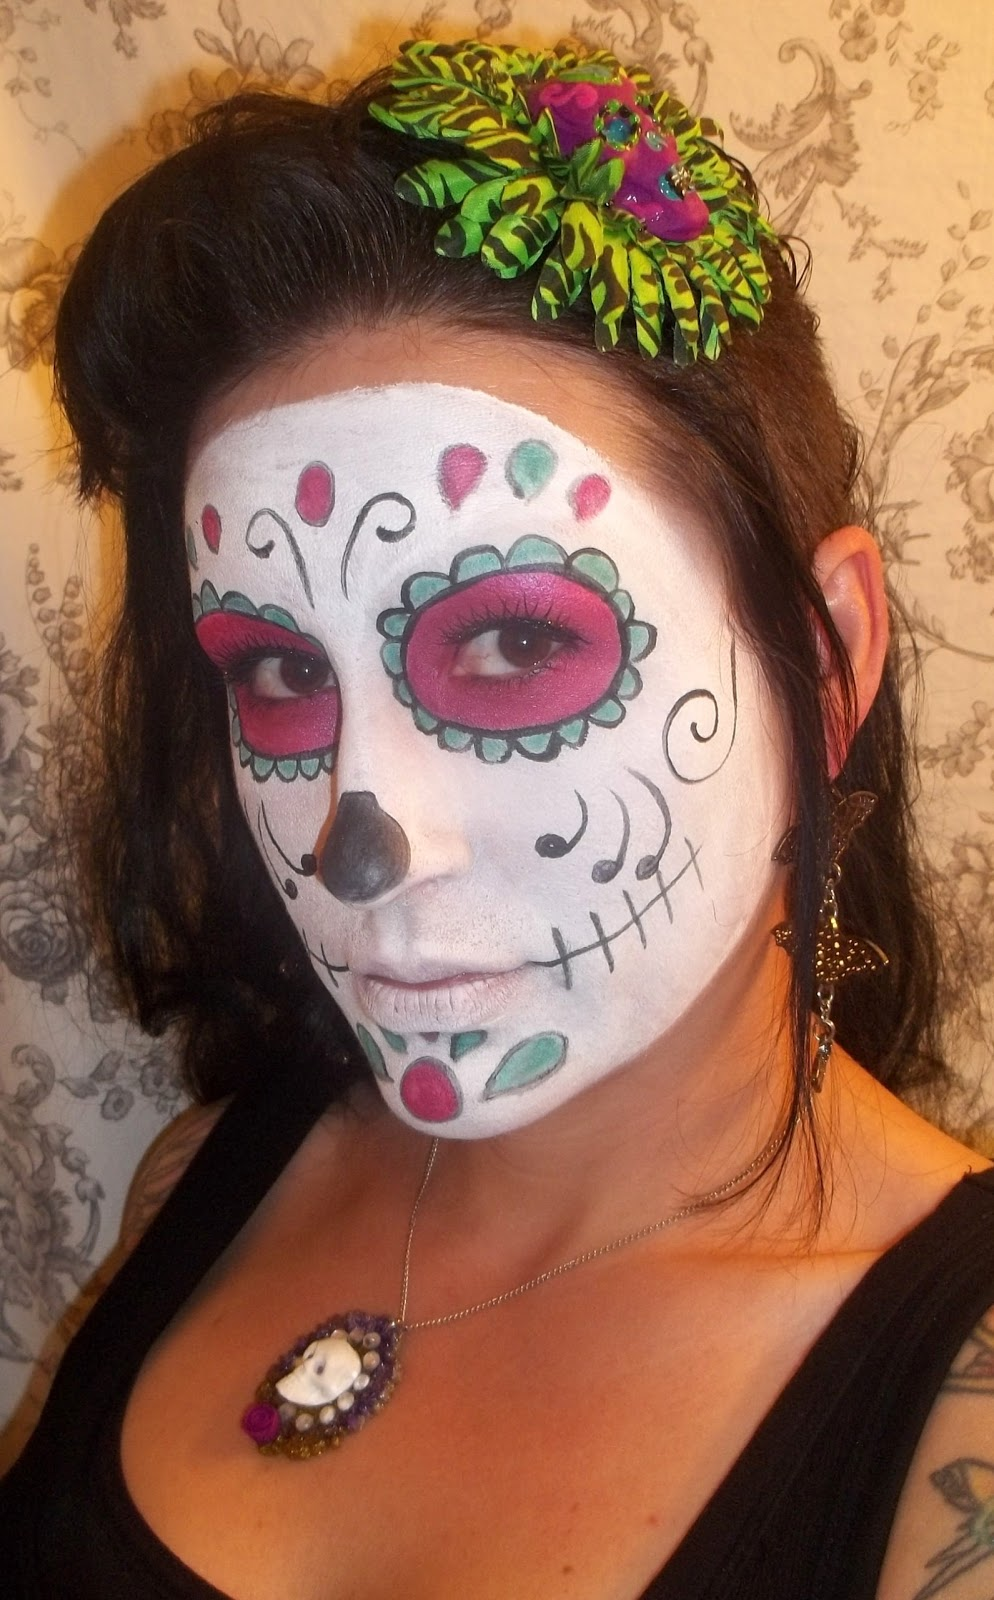 Bethezda Preoccupations Sugar Skull Makeup Tutorial